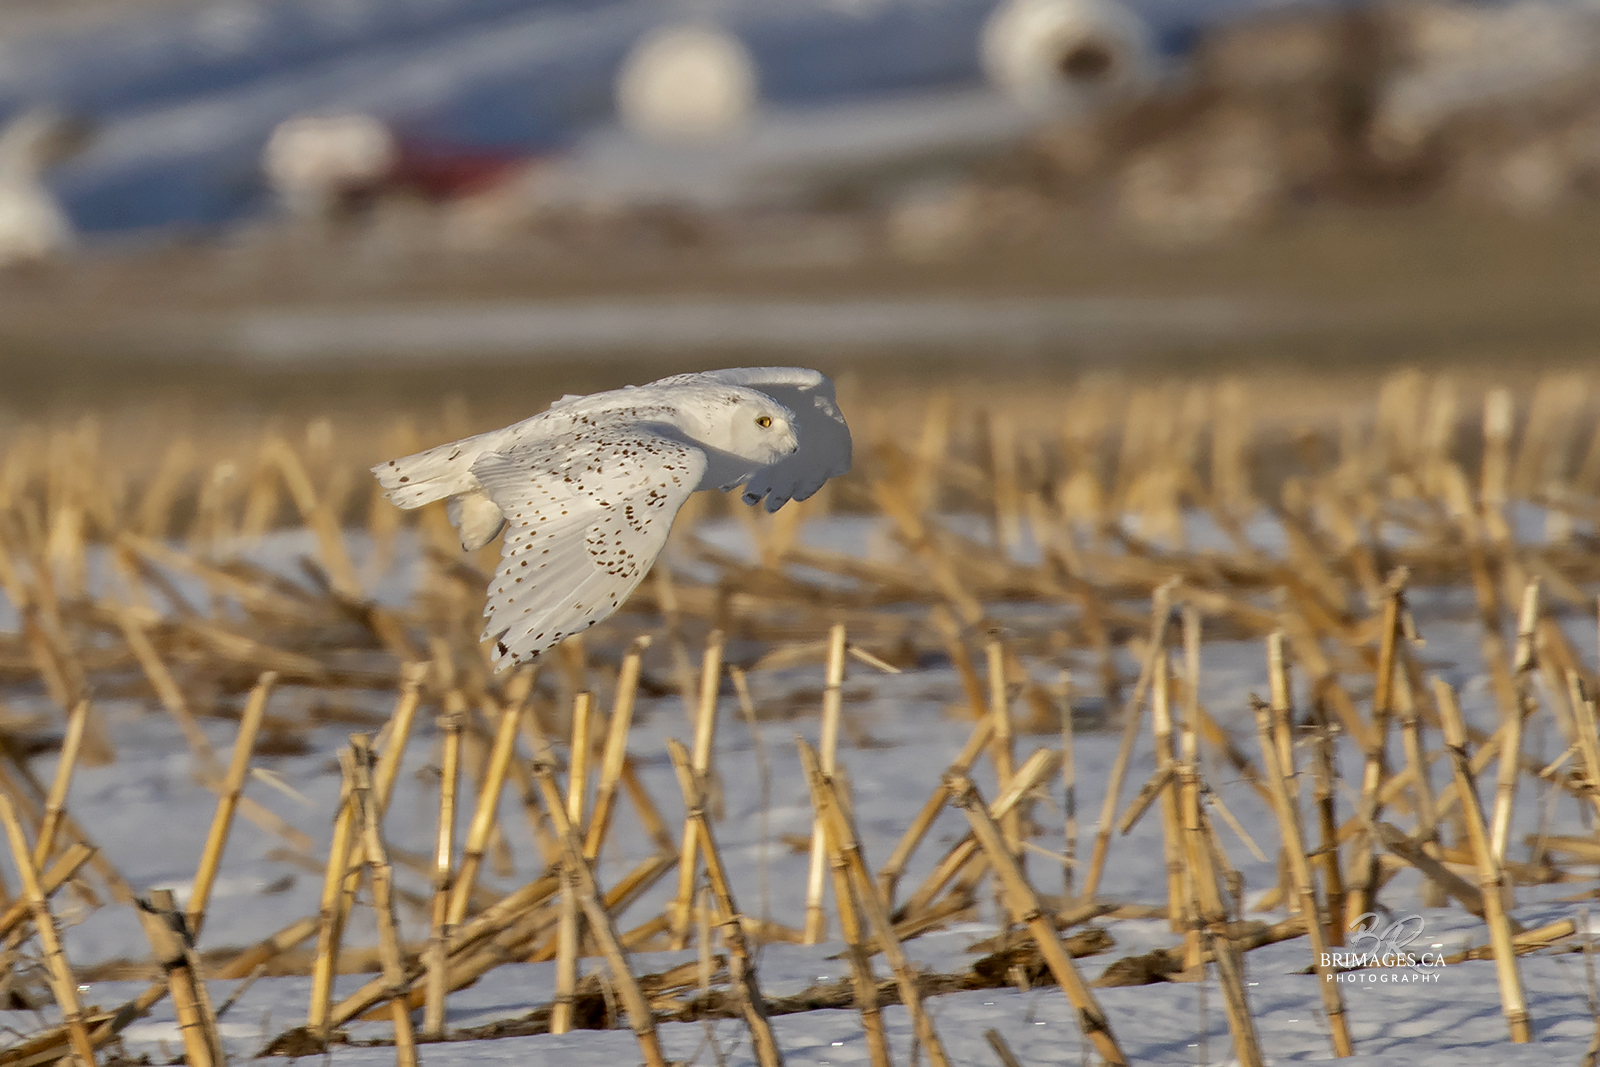 snowy-owl-in-flight-new-brunswick-2-BRimages.ca